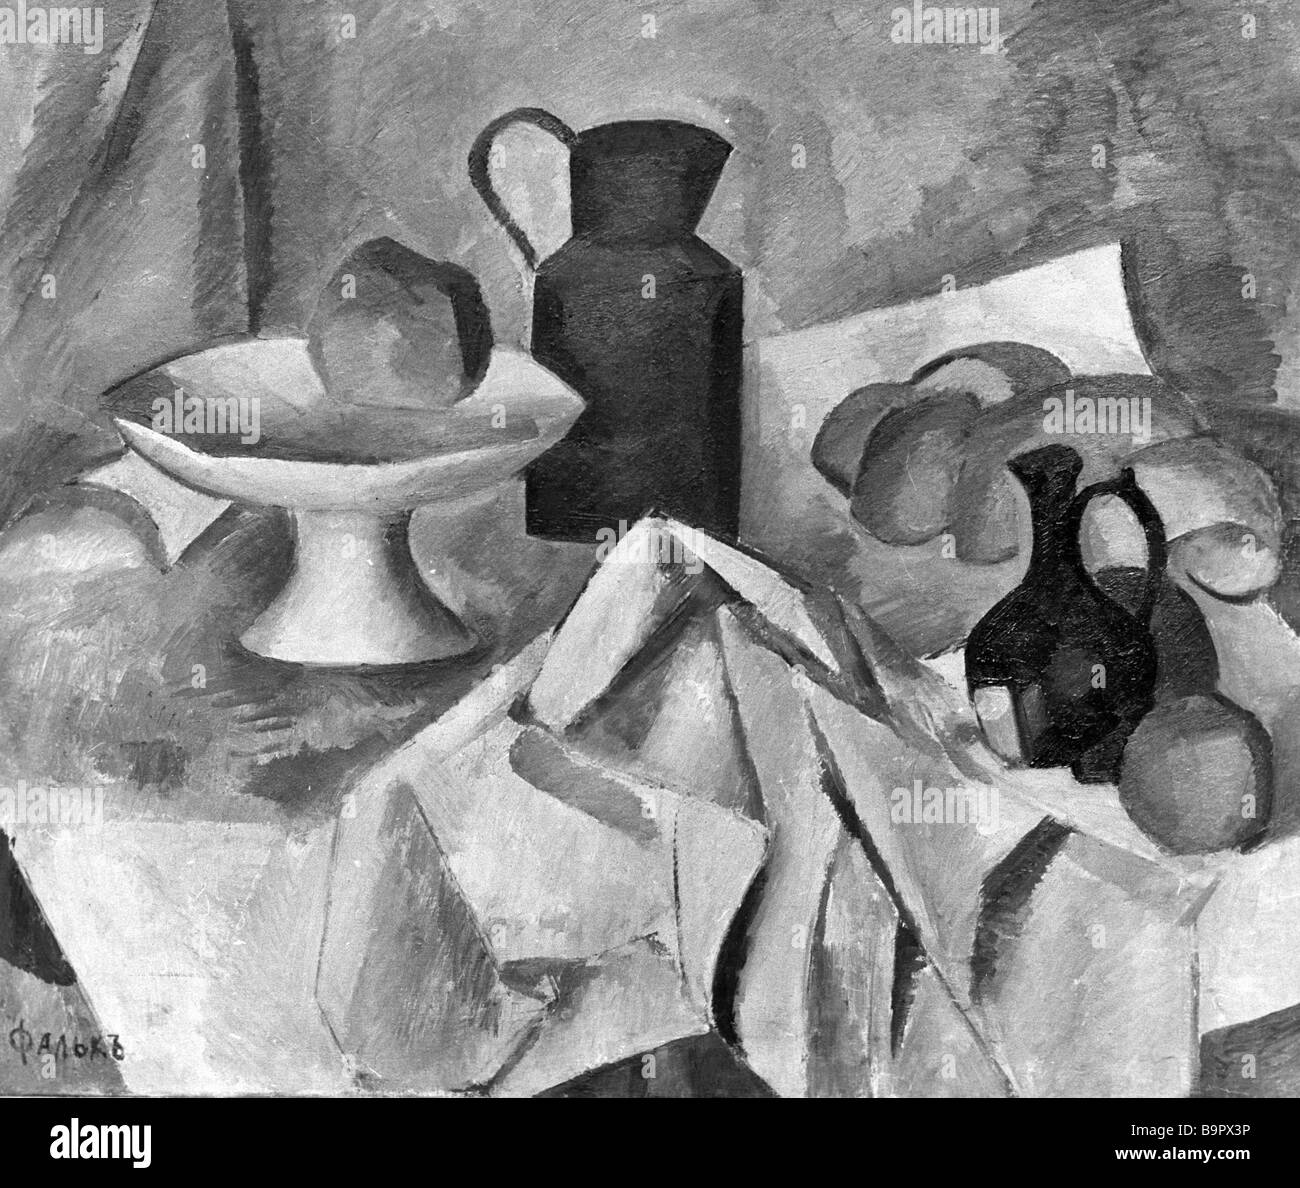 Robert Falk s reproduced Still life on white cloth - Stock Image